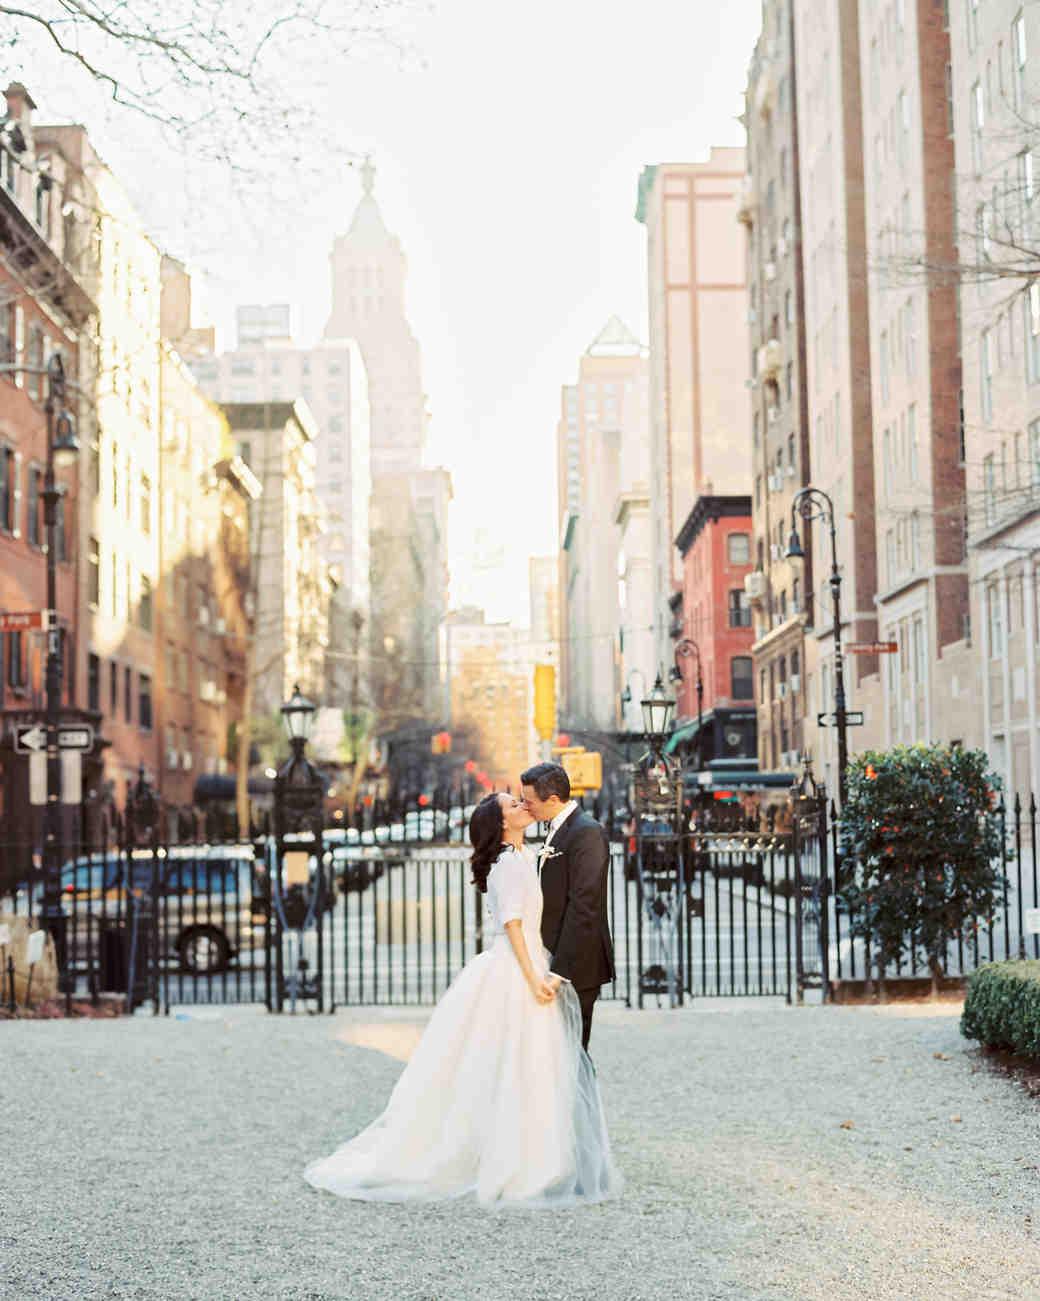 lori-jan-wedding-couple-00207-s112305-1215.jpg